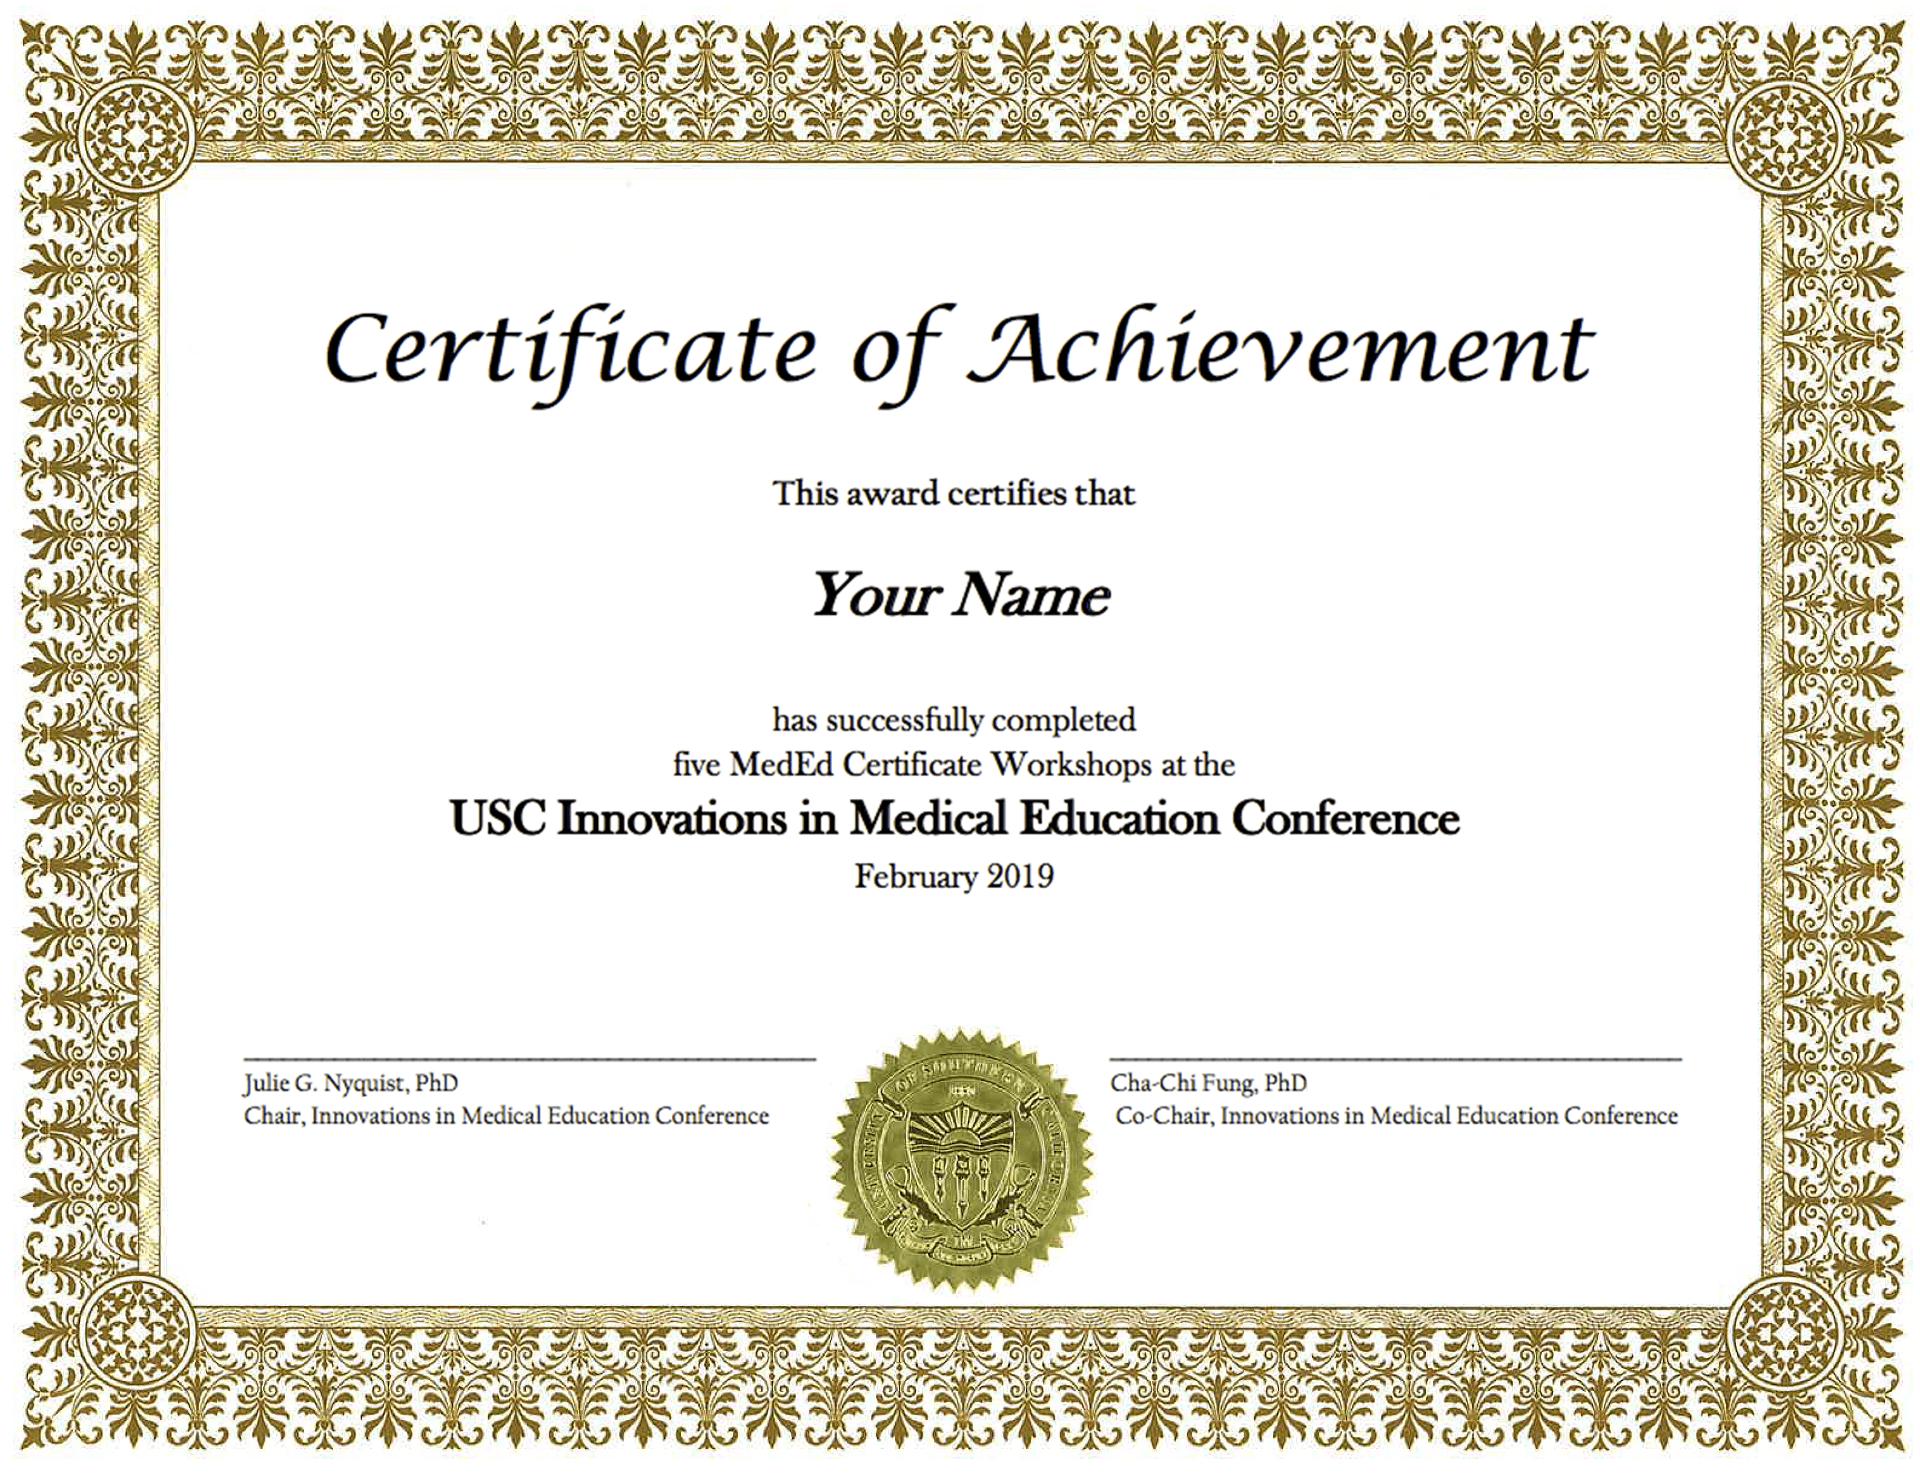 MedEd Certificate